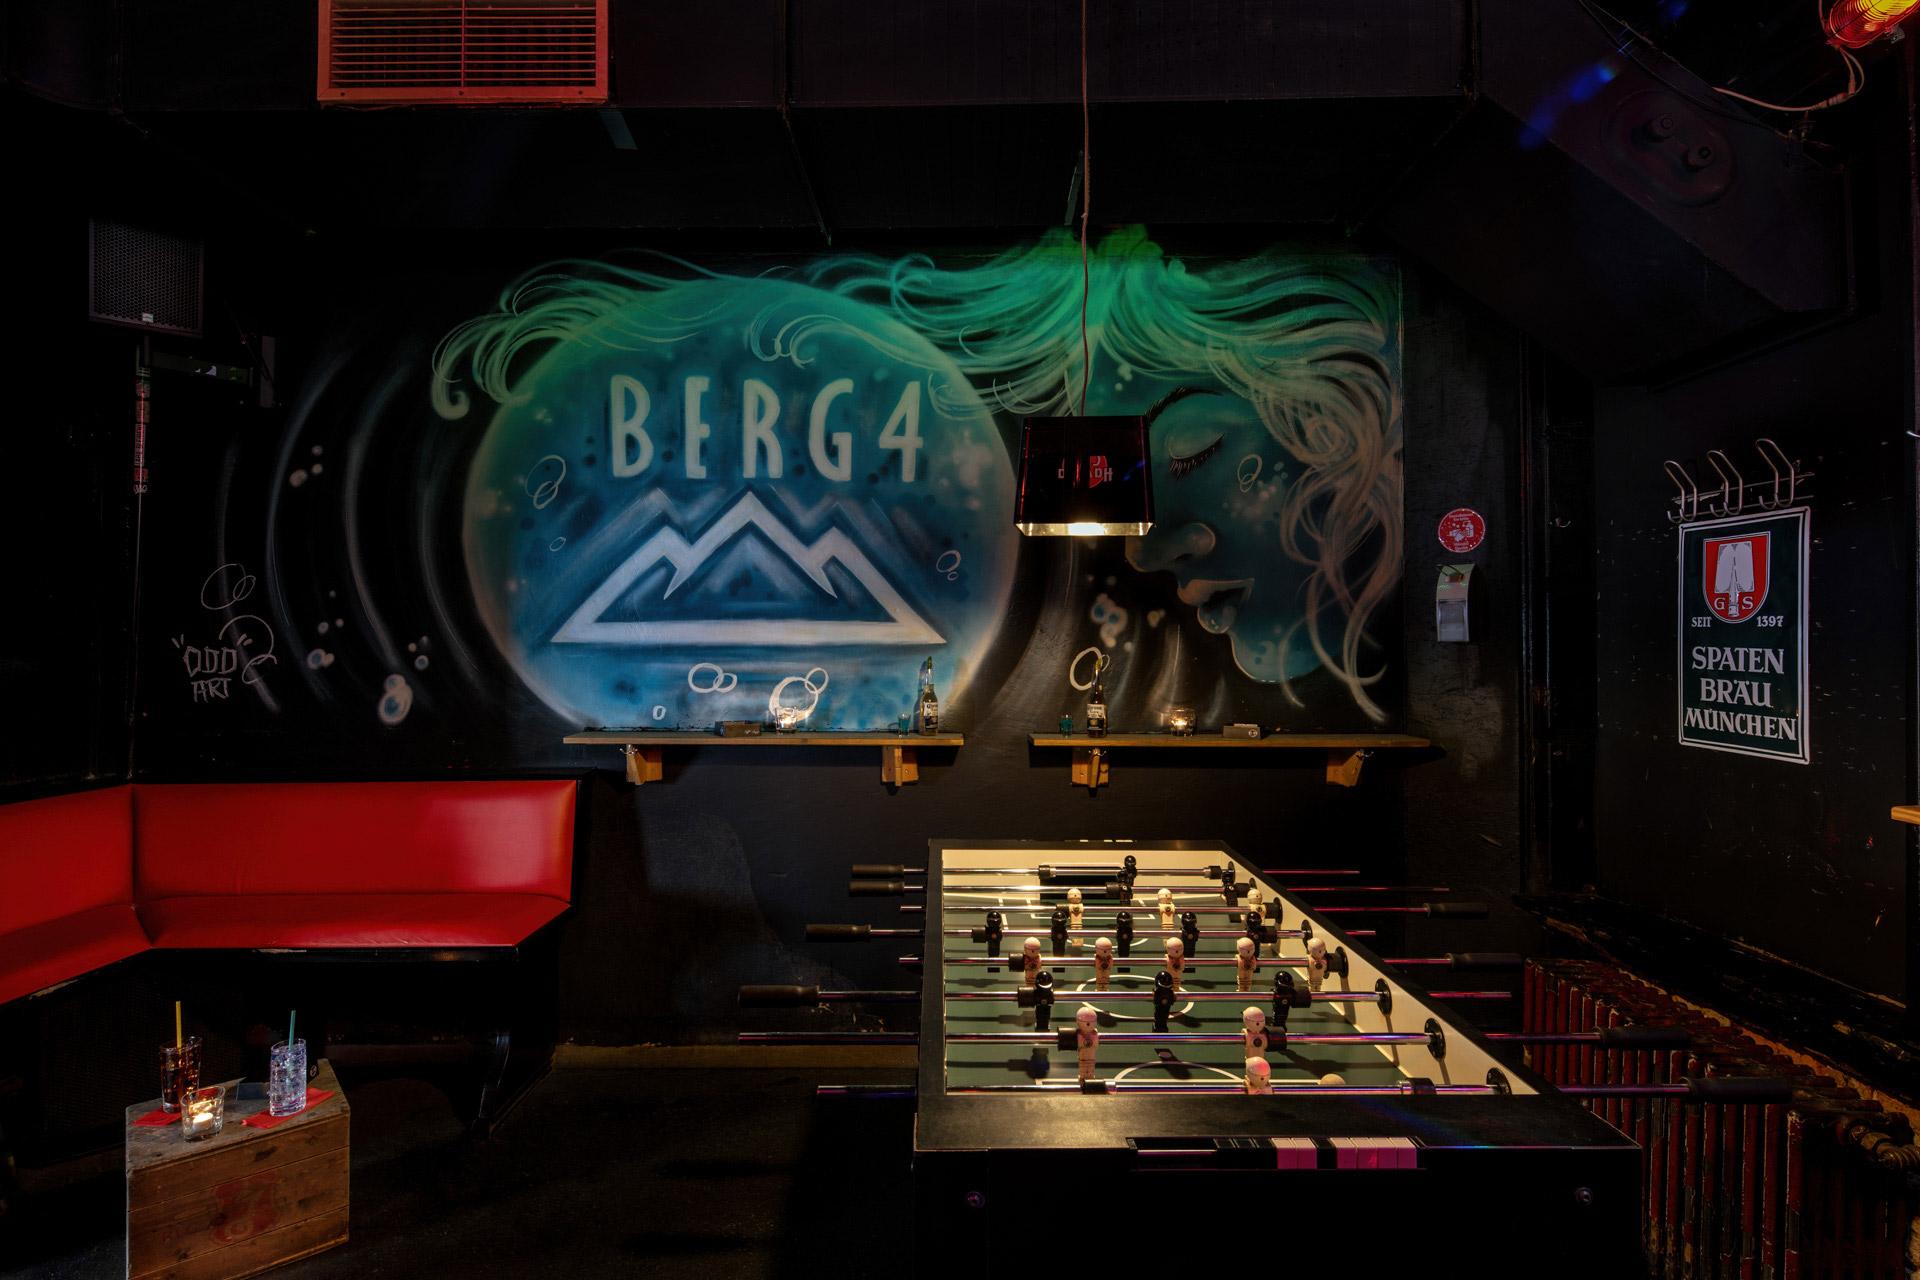 berg4-bar-stpauli-hamburg-kicker-2067